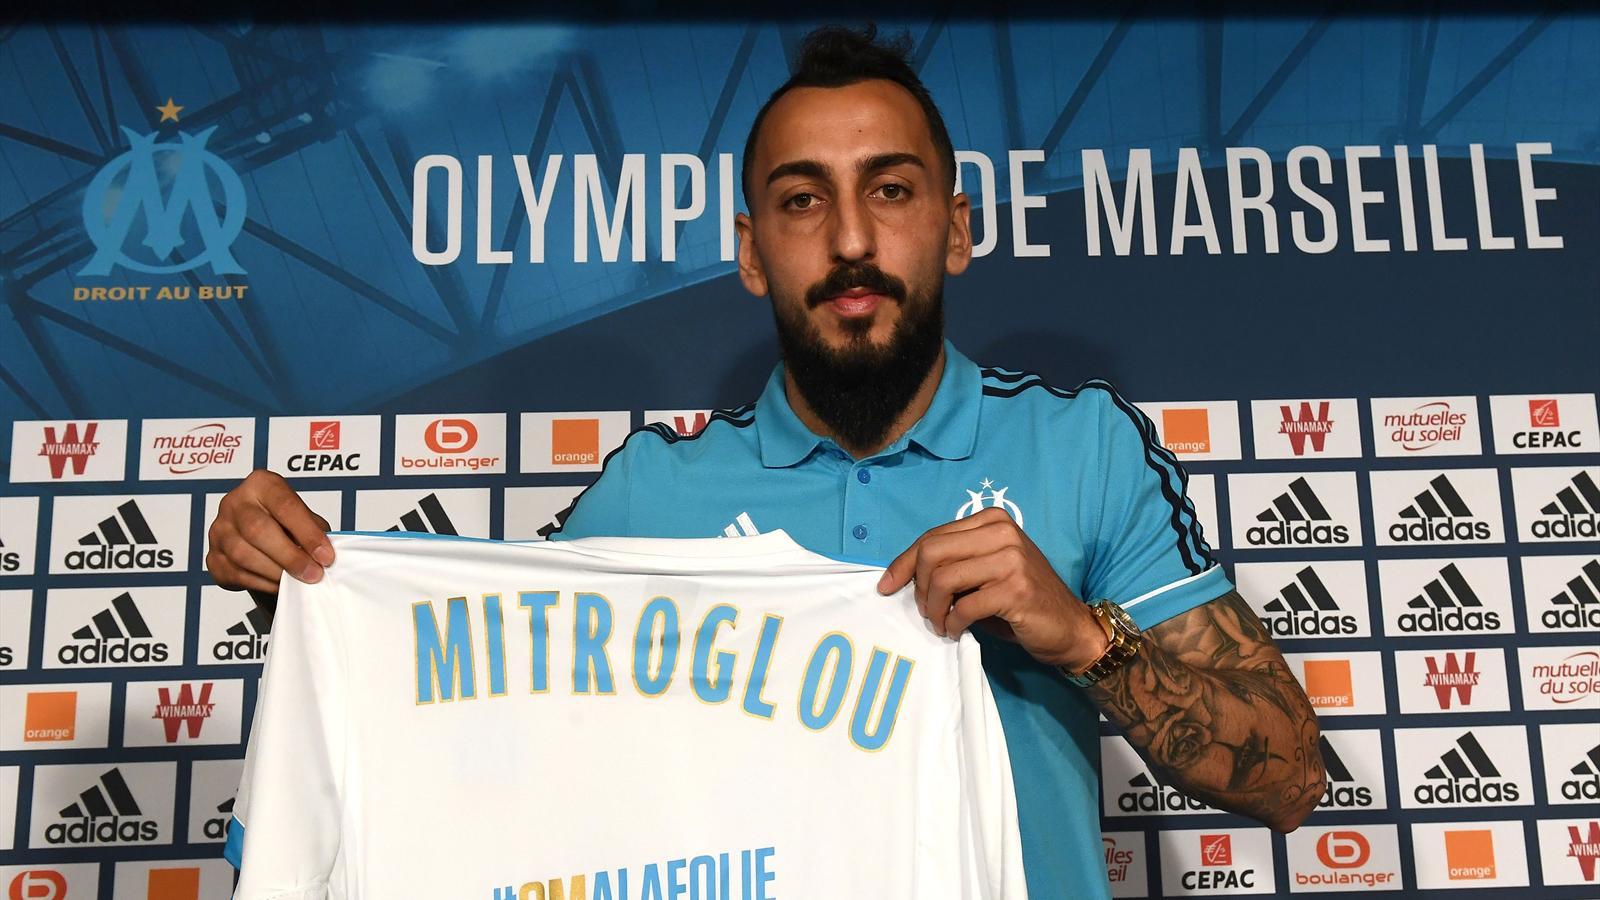 Maillot Domicile Olympique de Marseille Konstantinos MITROGLOU